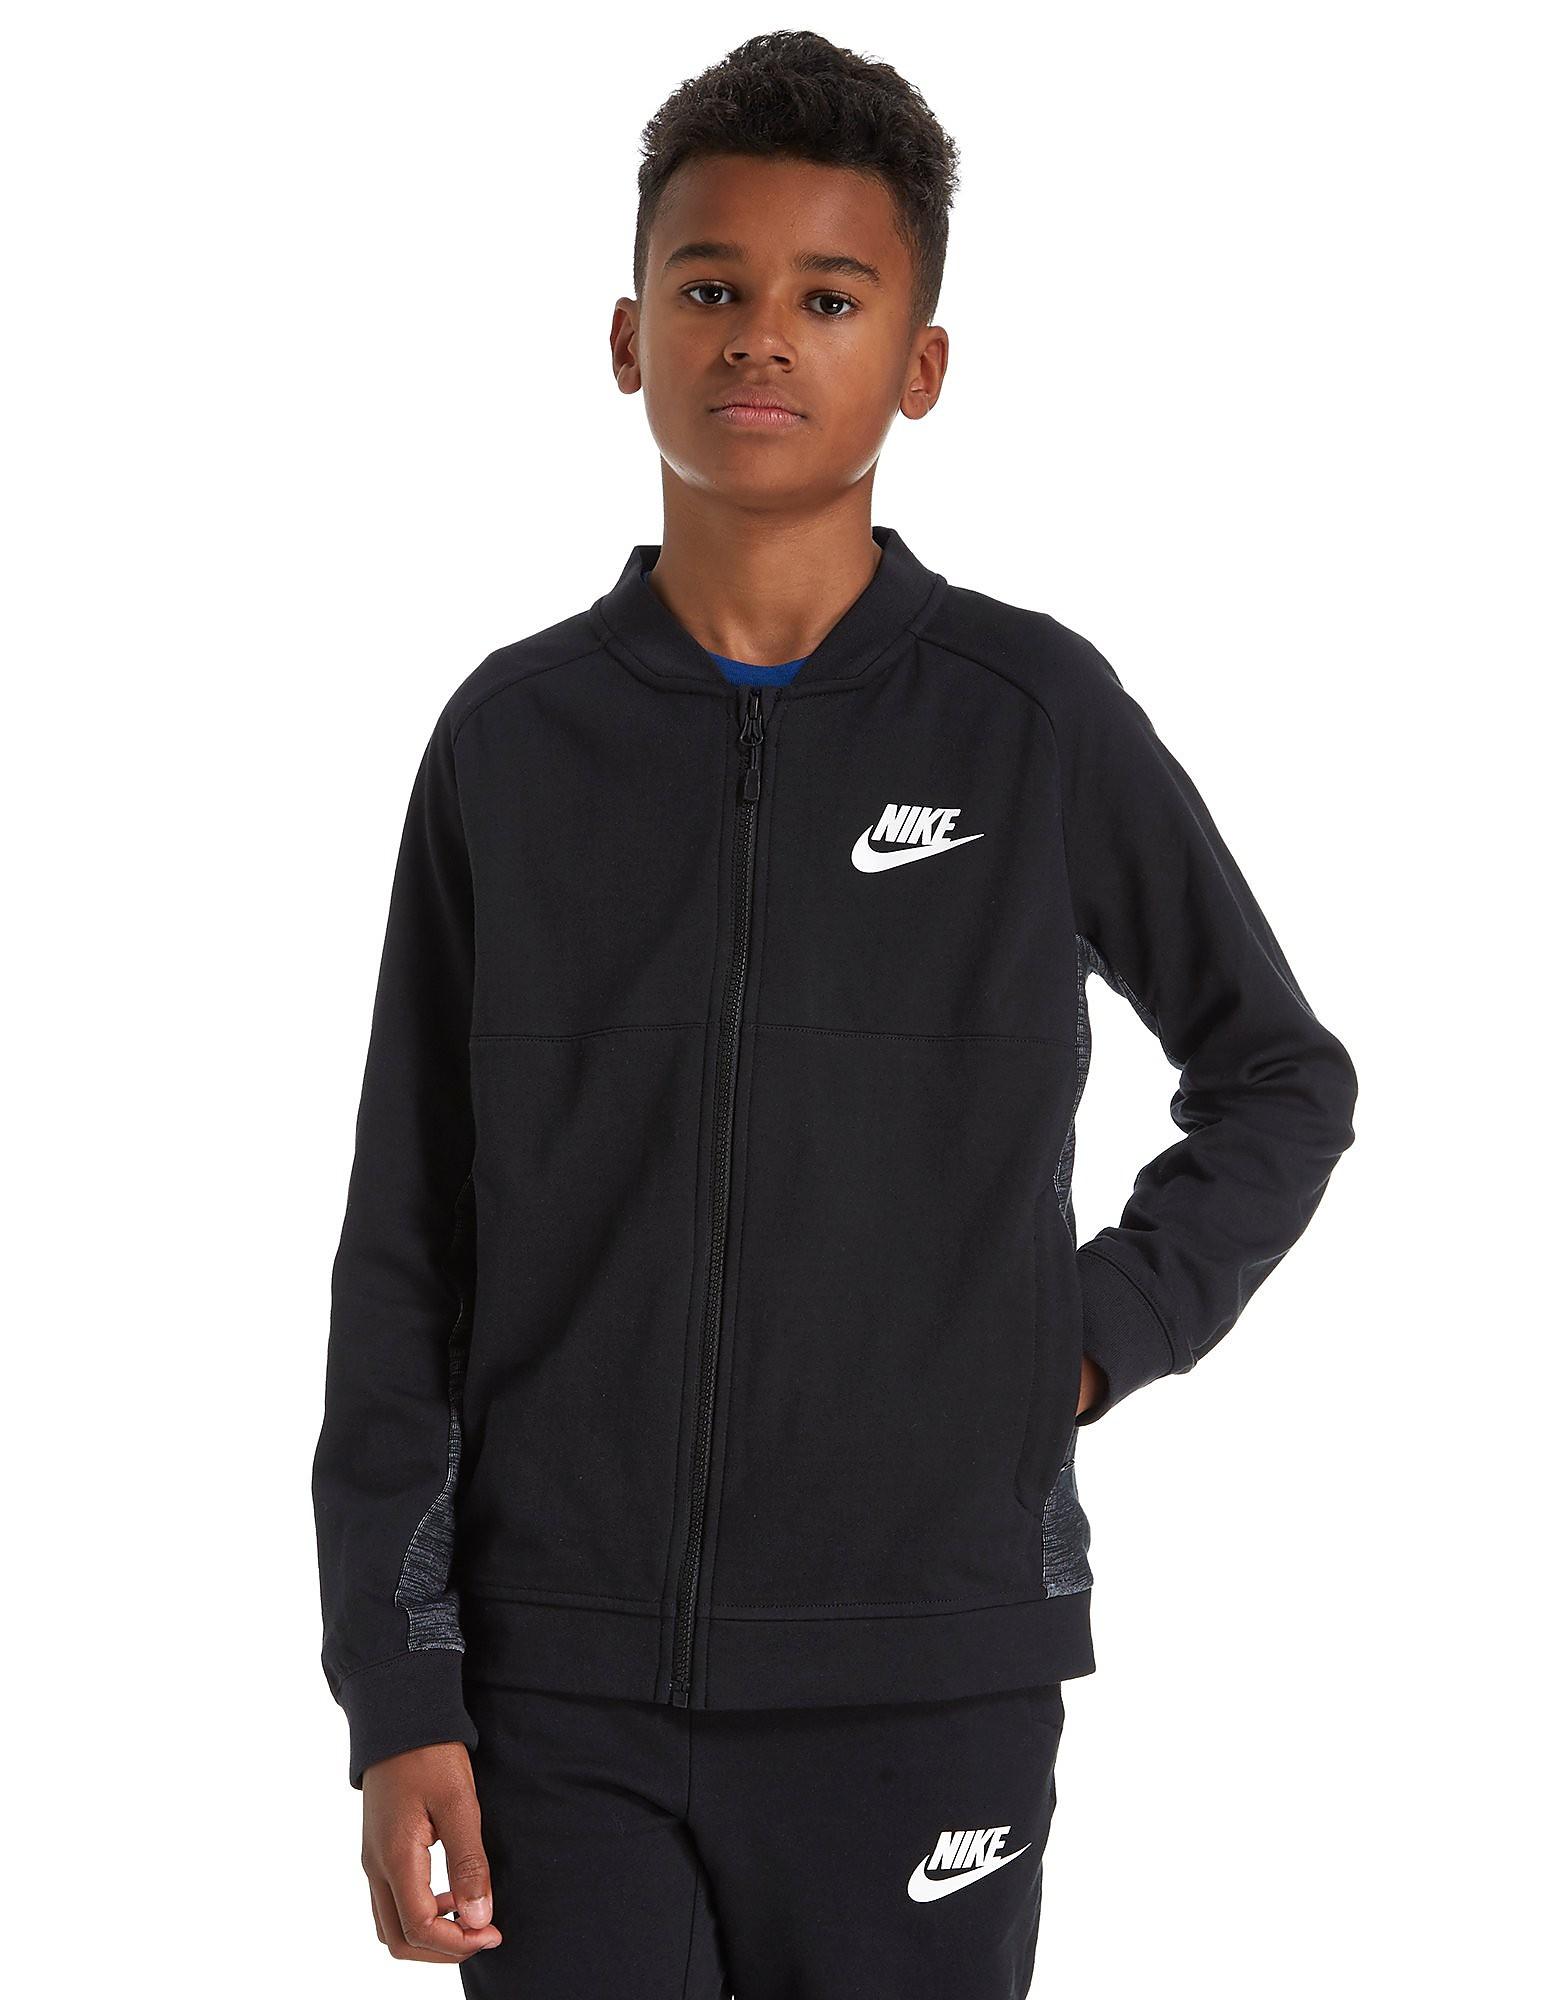 Nike Advance Bomber Jacket Junior